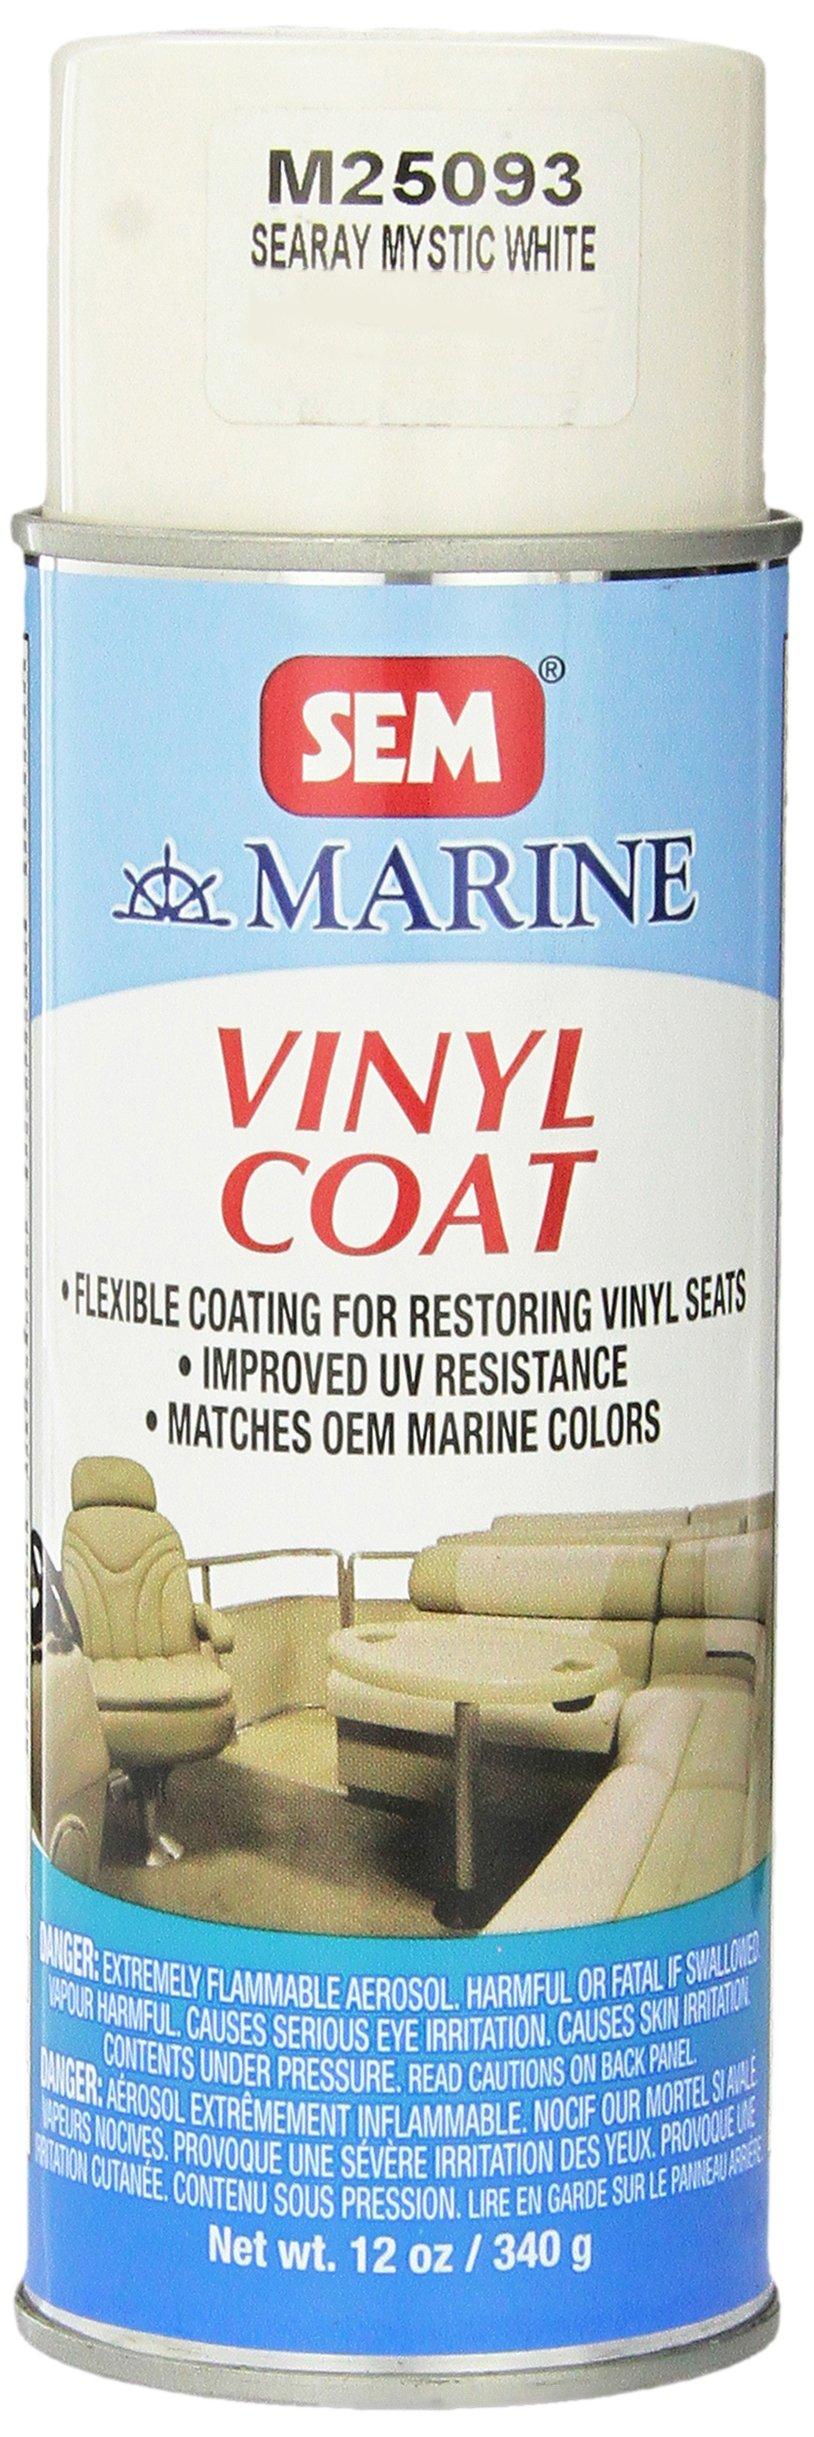 SEM M25093 Sea Ray Mystic White Marine Vinyl Coat - 12 oz. Package may vary